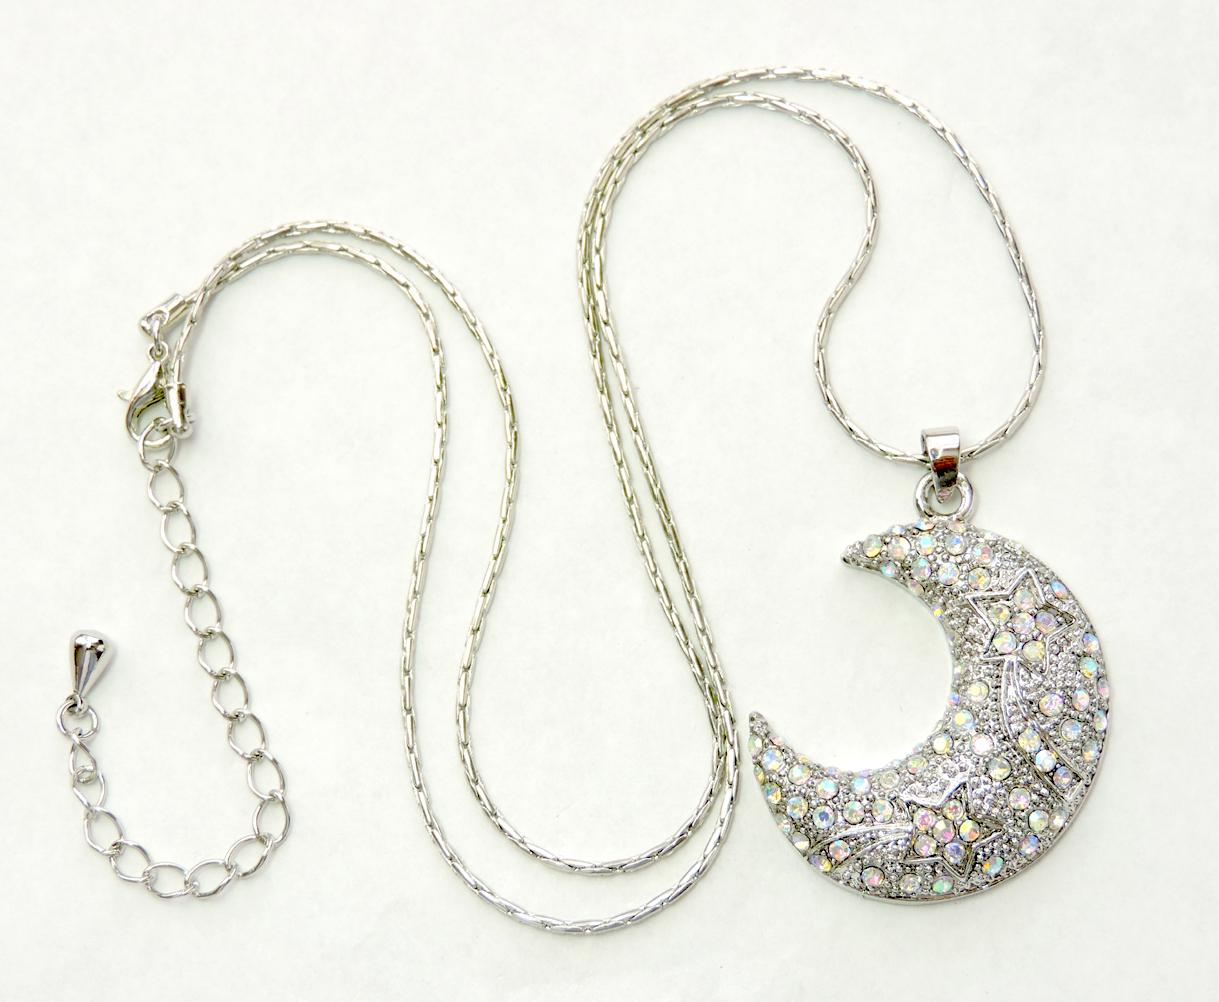 Moon Crescent Star Pendant Necklace